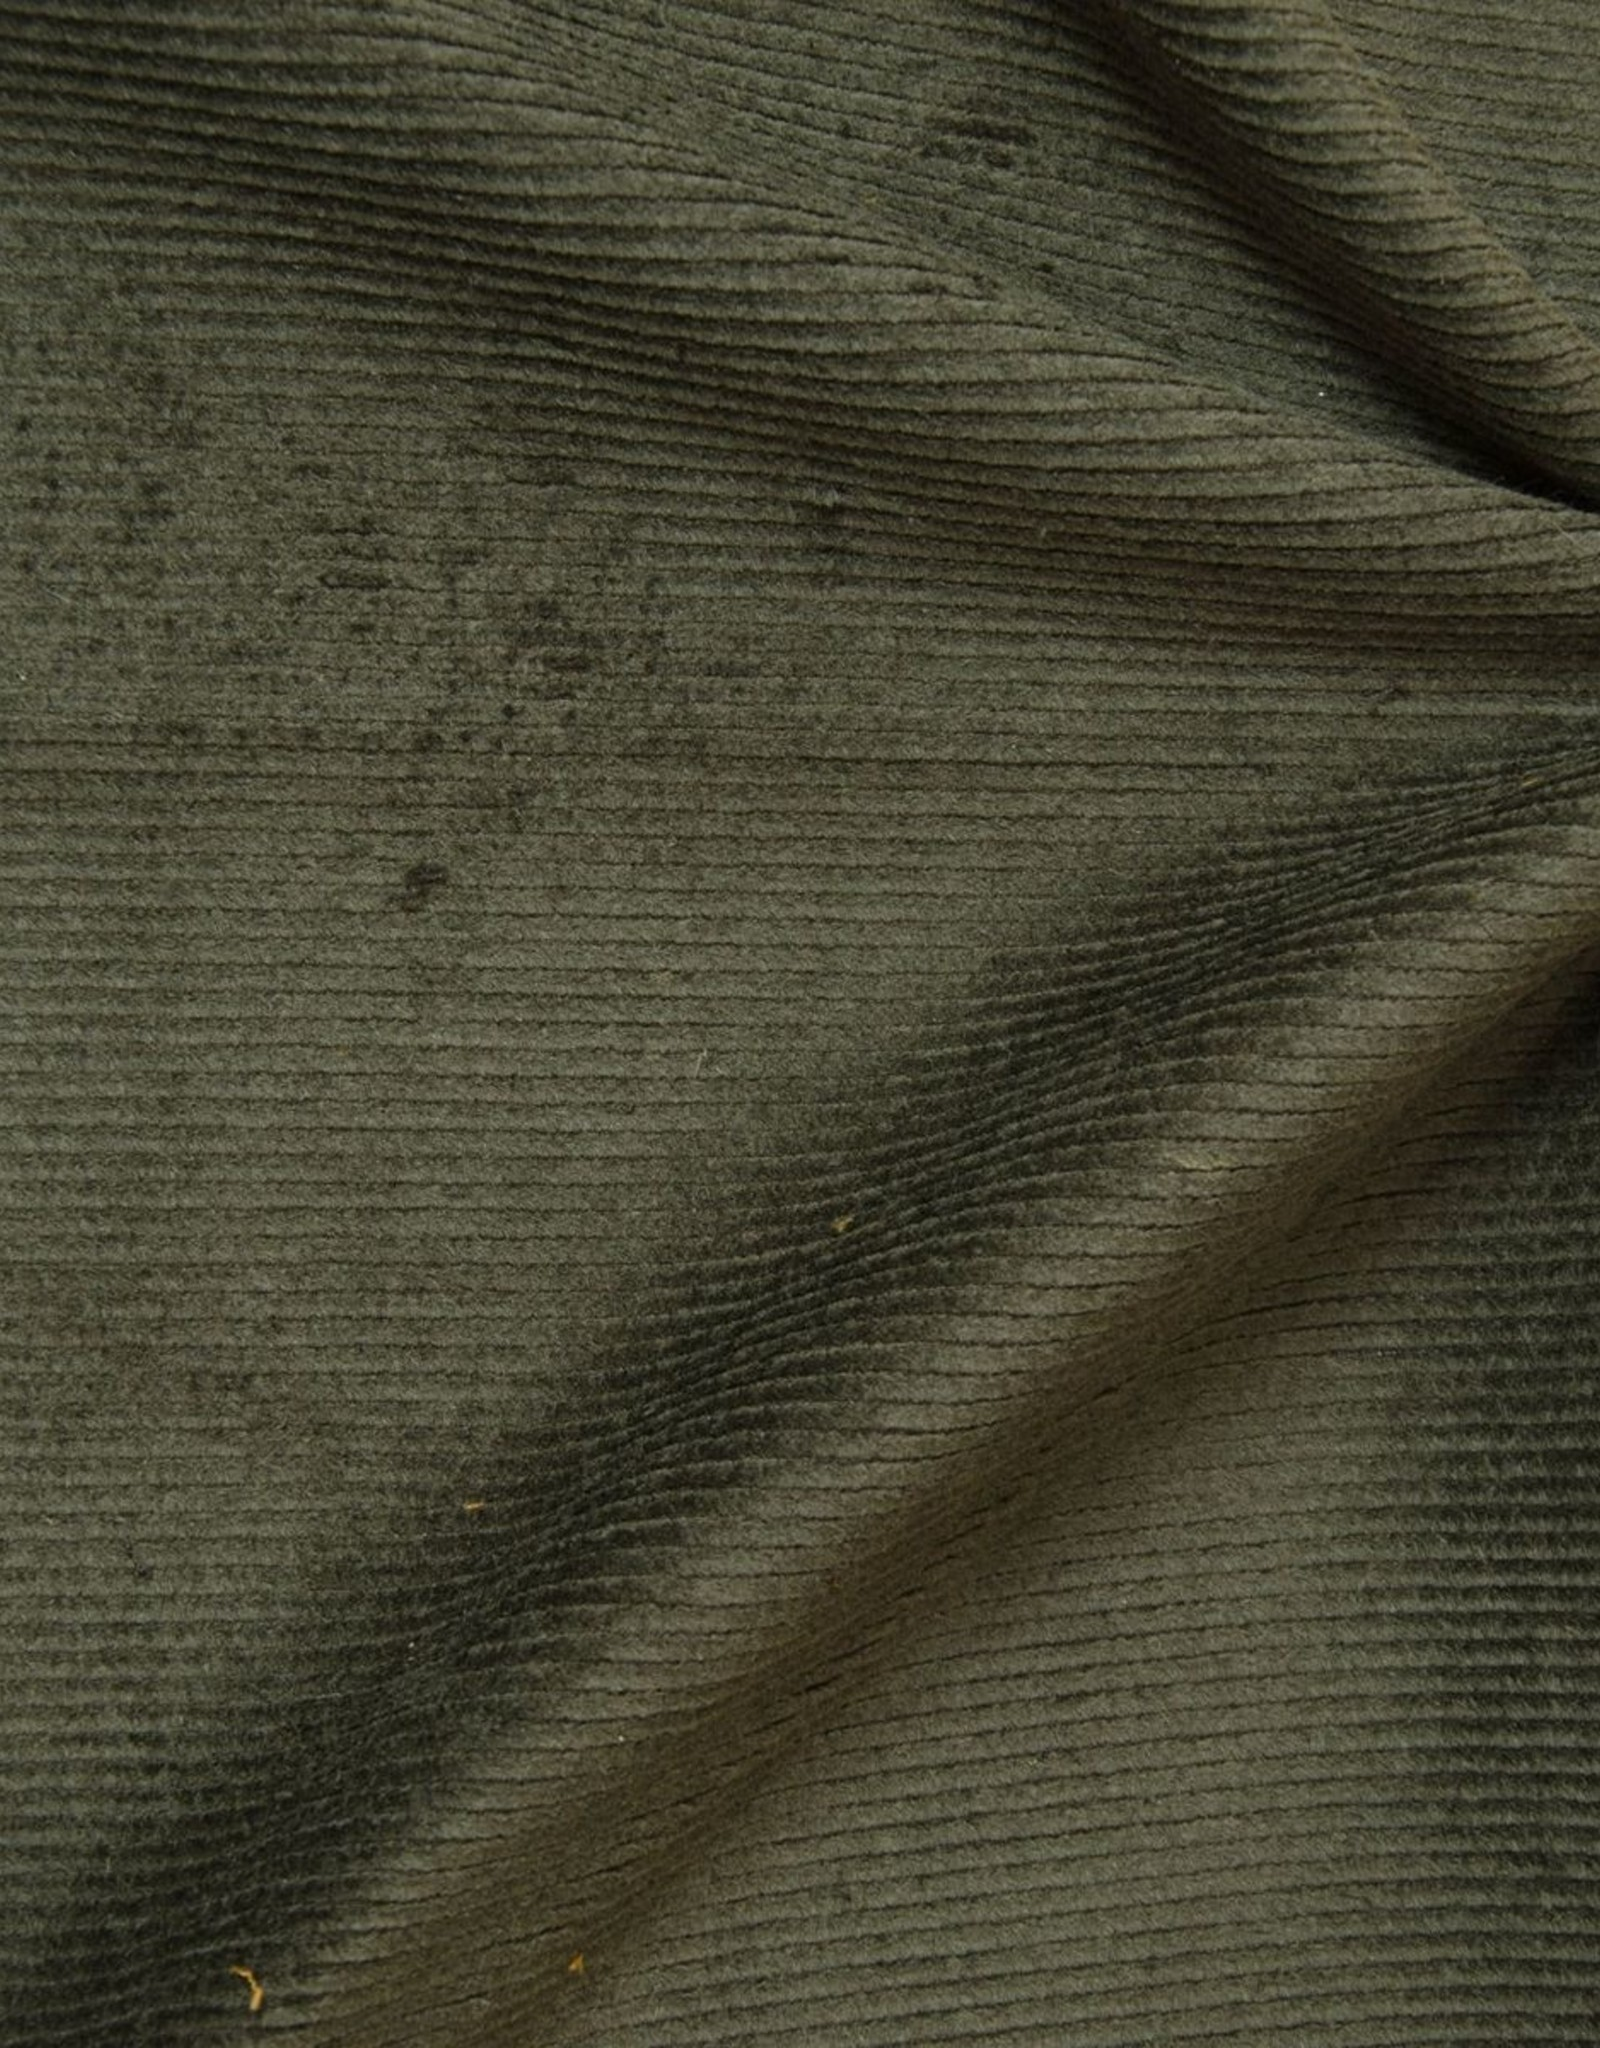 Hilco Kakigrijze ribfluweel